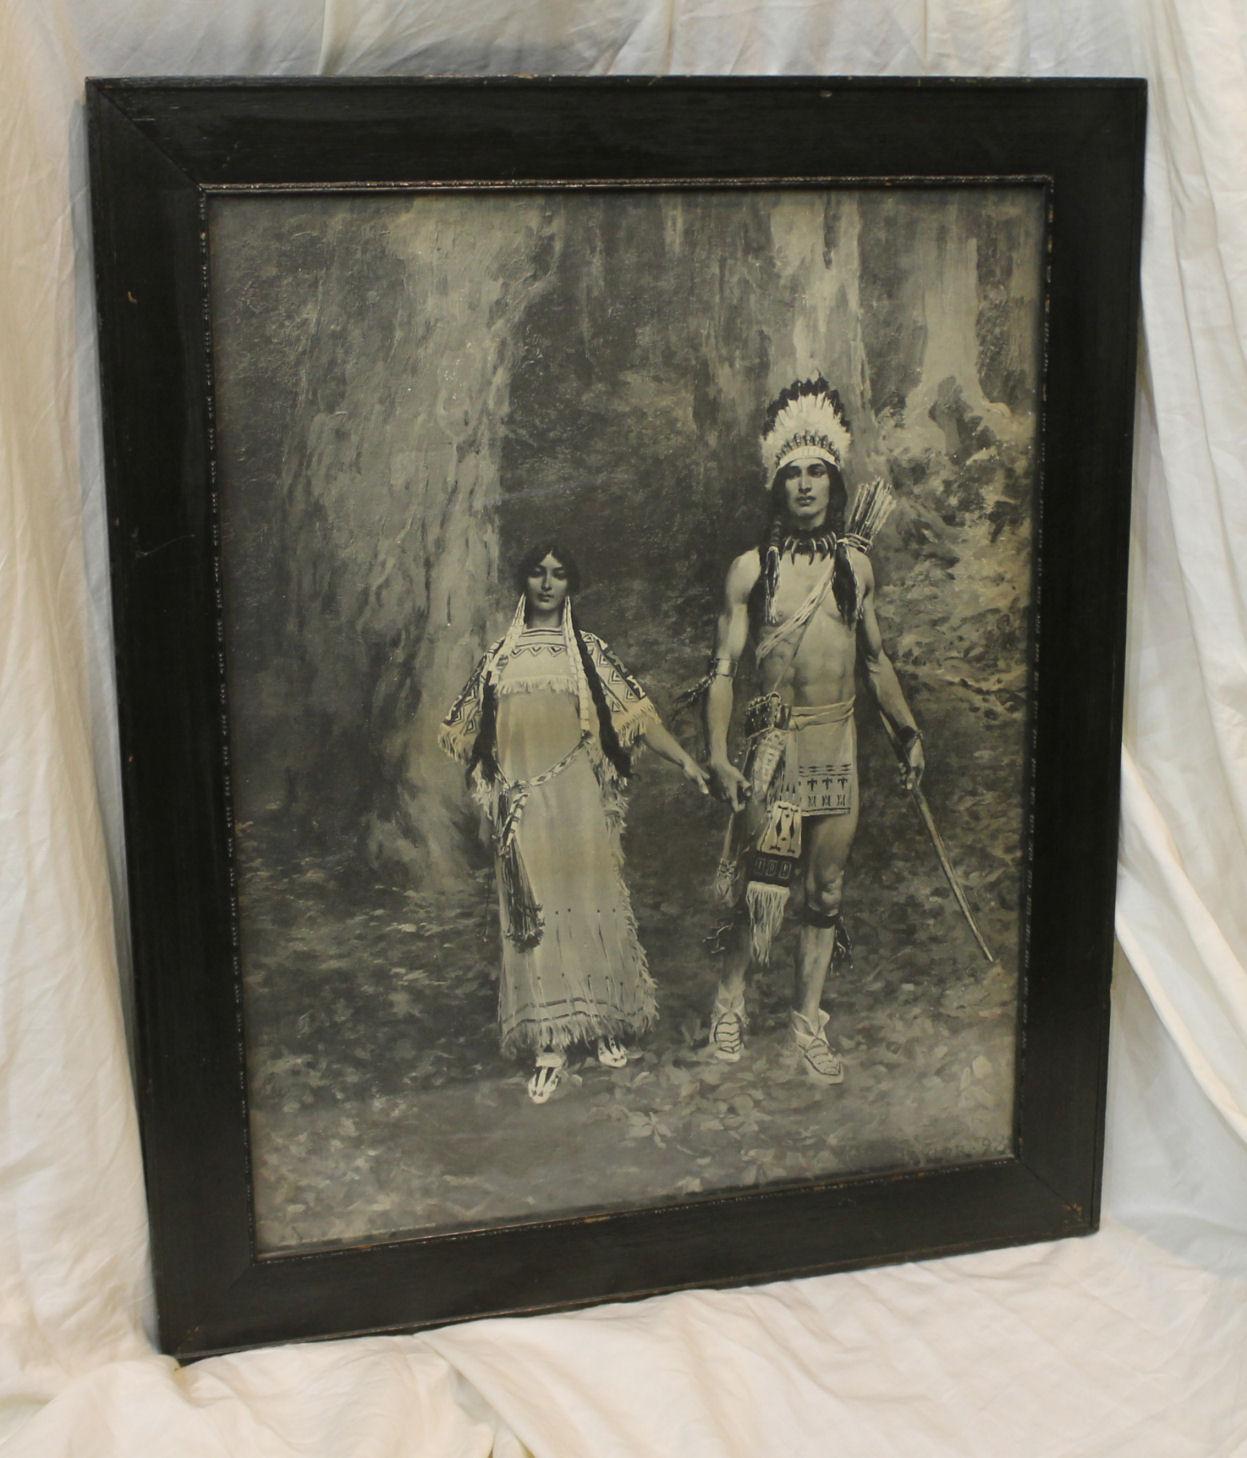 Native American Indian Prints